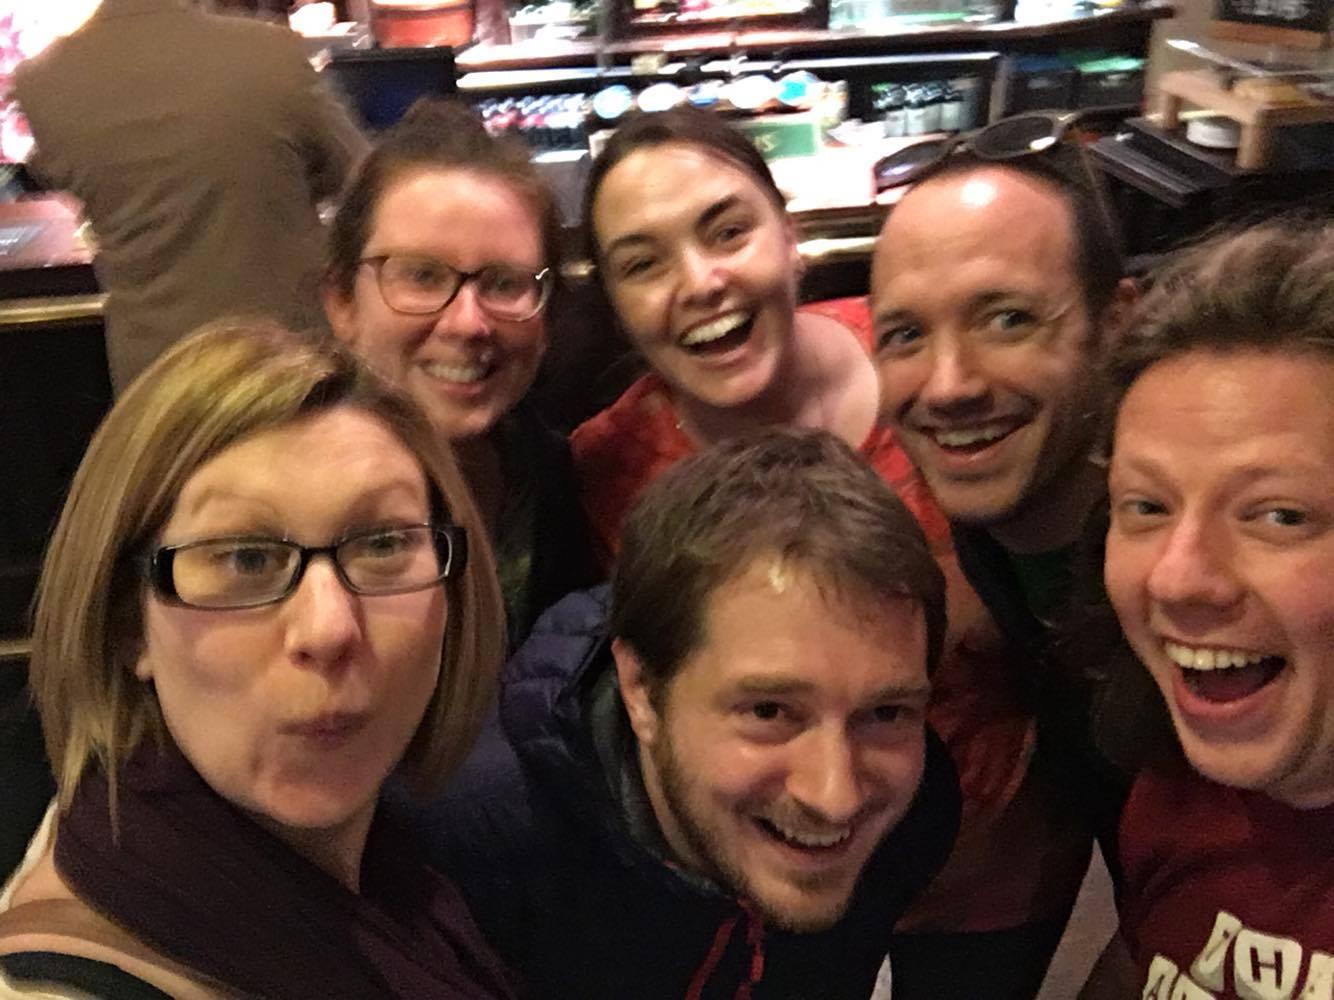 Meet a 7in7 Volunteer: Jon Gracey